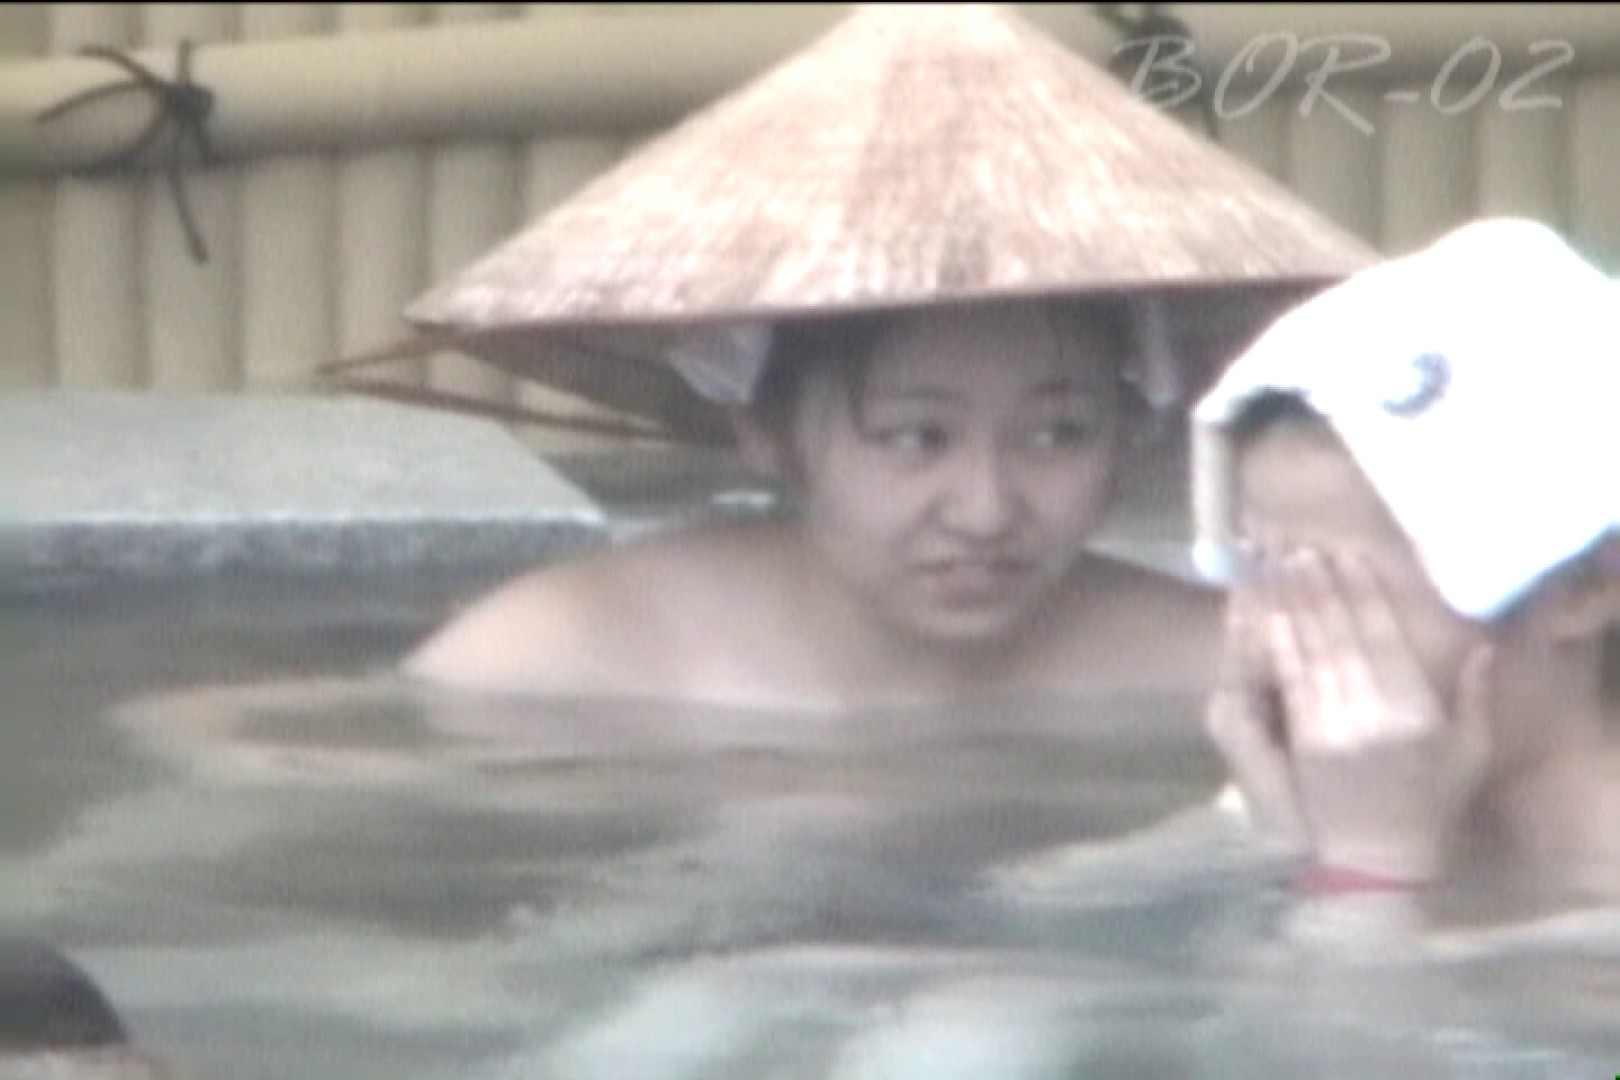 Aquaな露天風呂Vol.475 OLのプライベート | 盗撮特撮  11pic 10